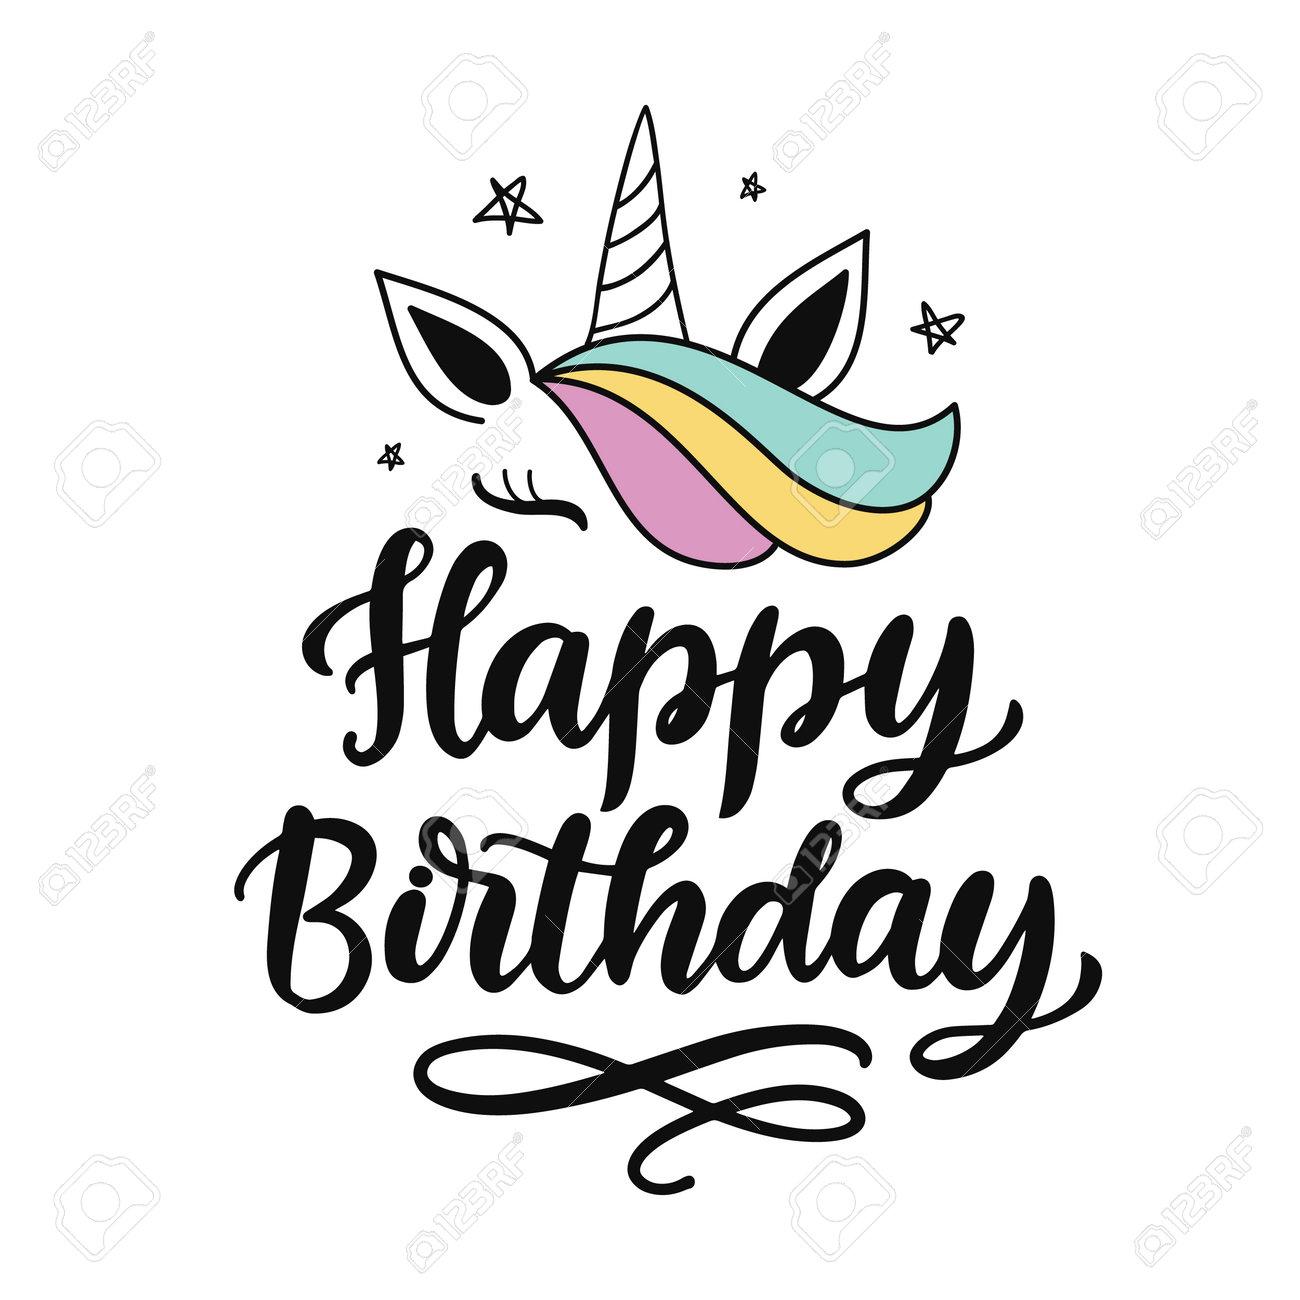 Happy Birthday cute hand written lettering - 173111736